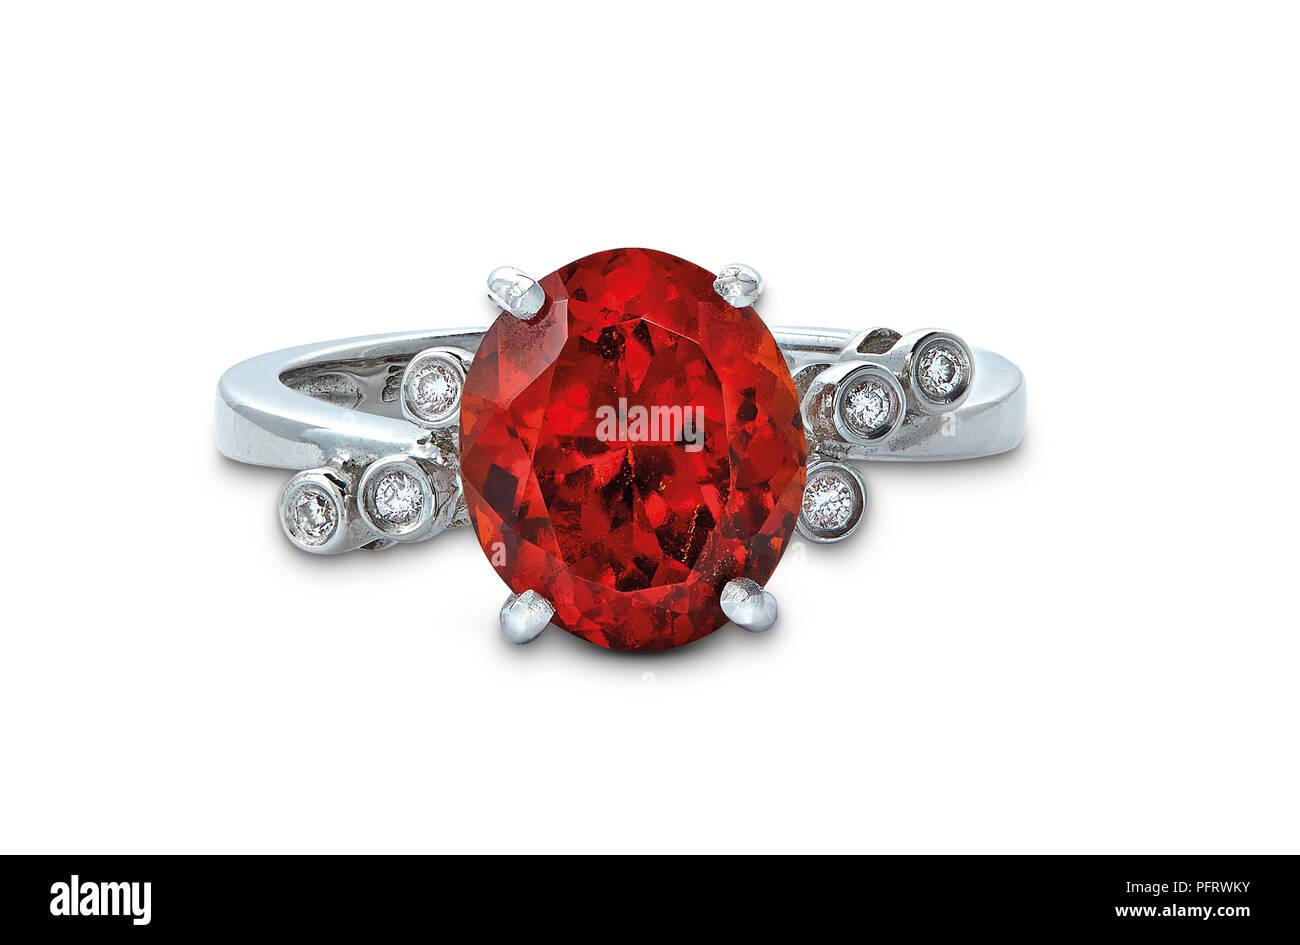 Edelstein Granat Hessonit Diamanten Ring Stockfoto Bild 216269311